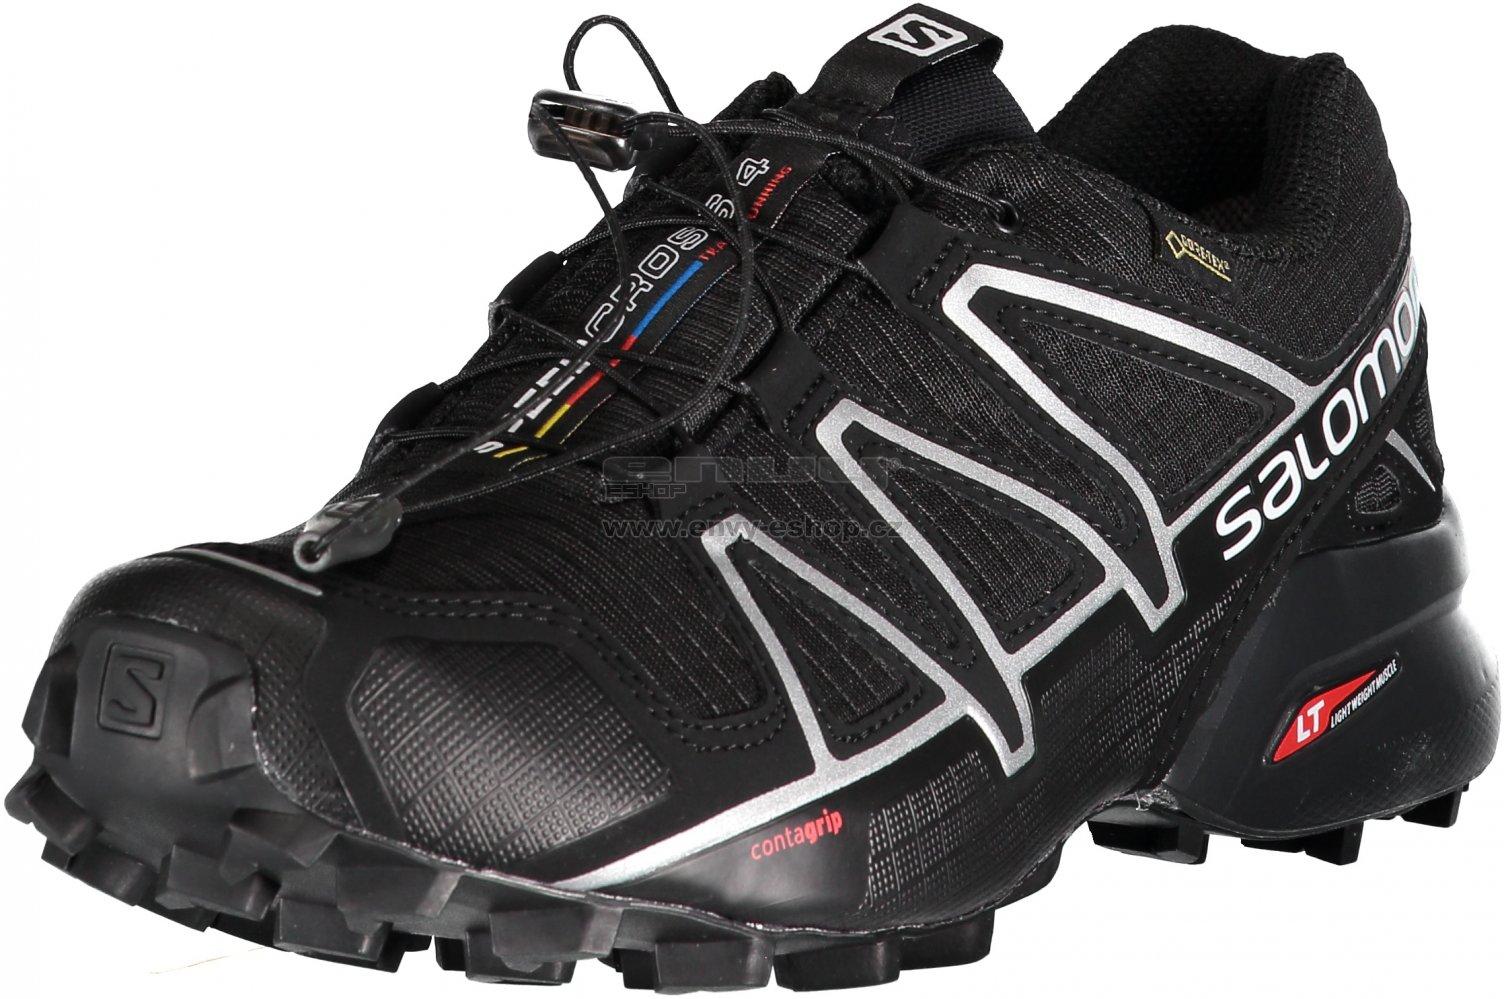 42572b083ab Pánské běžecké boty Salomon Speedcross 4 GTX Black black si velikost ...